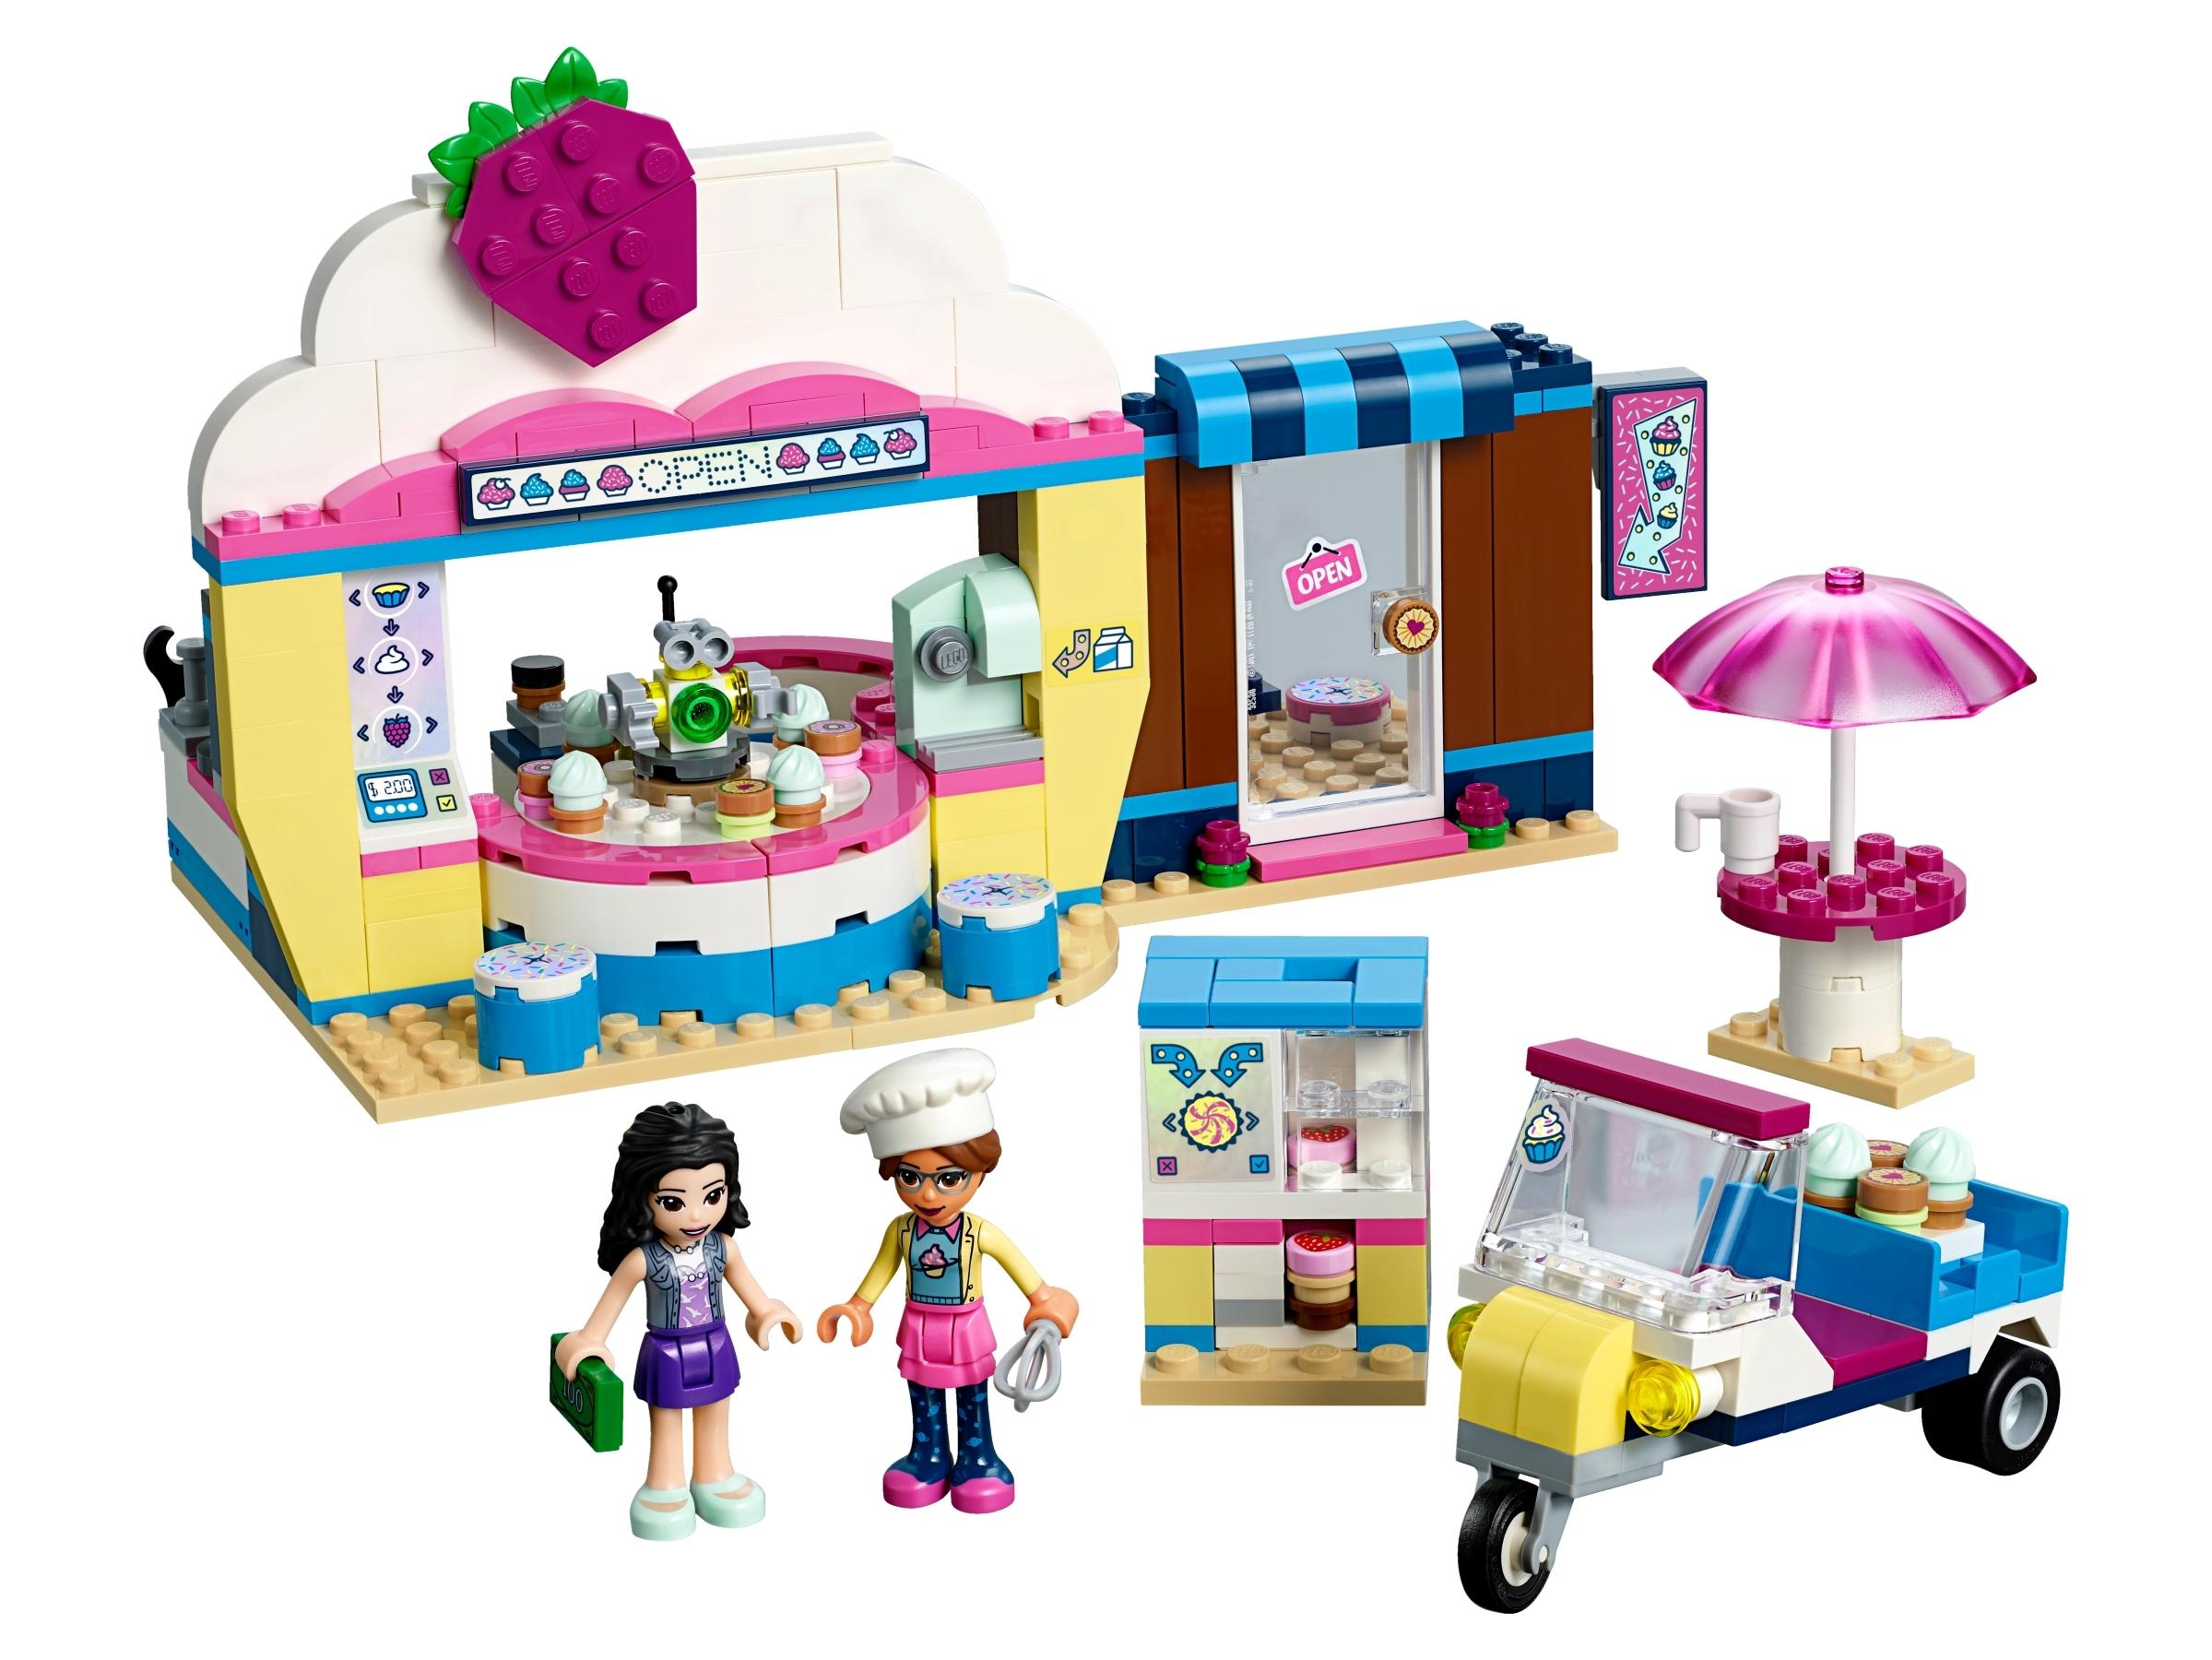 Assembled LEGO 41366 for Olivia's Cupcake Cafe